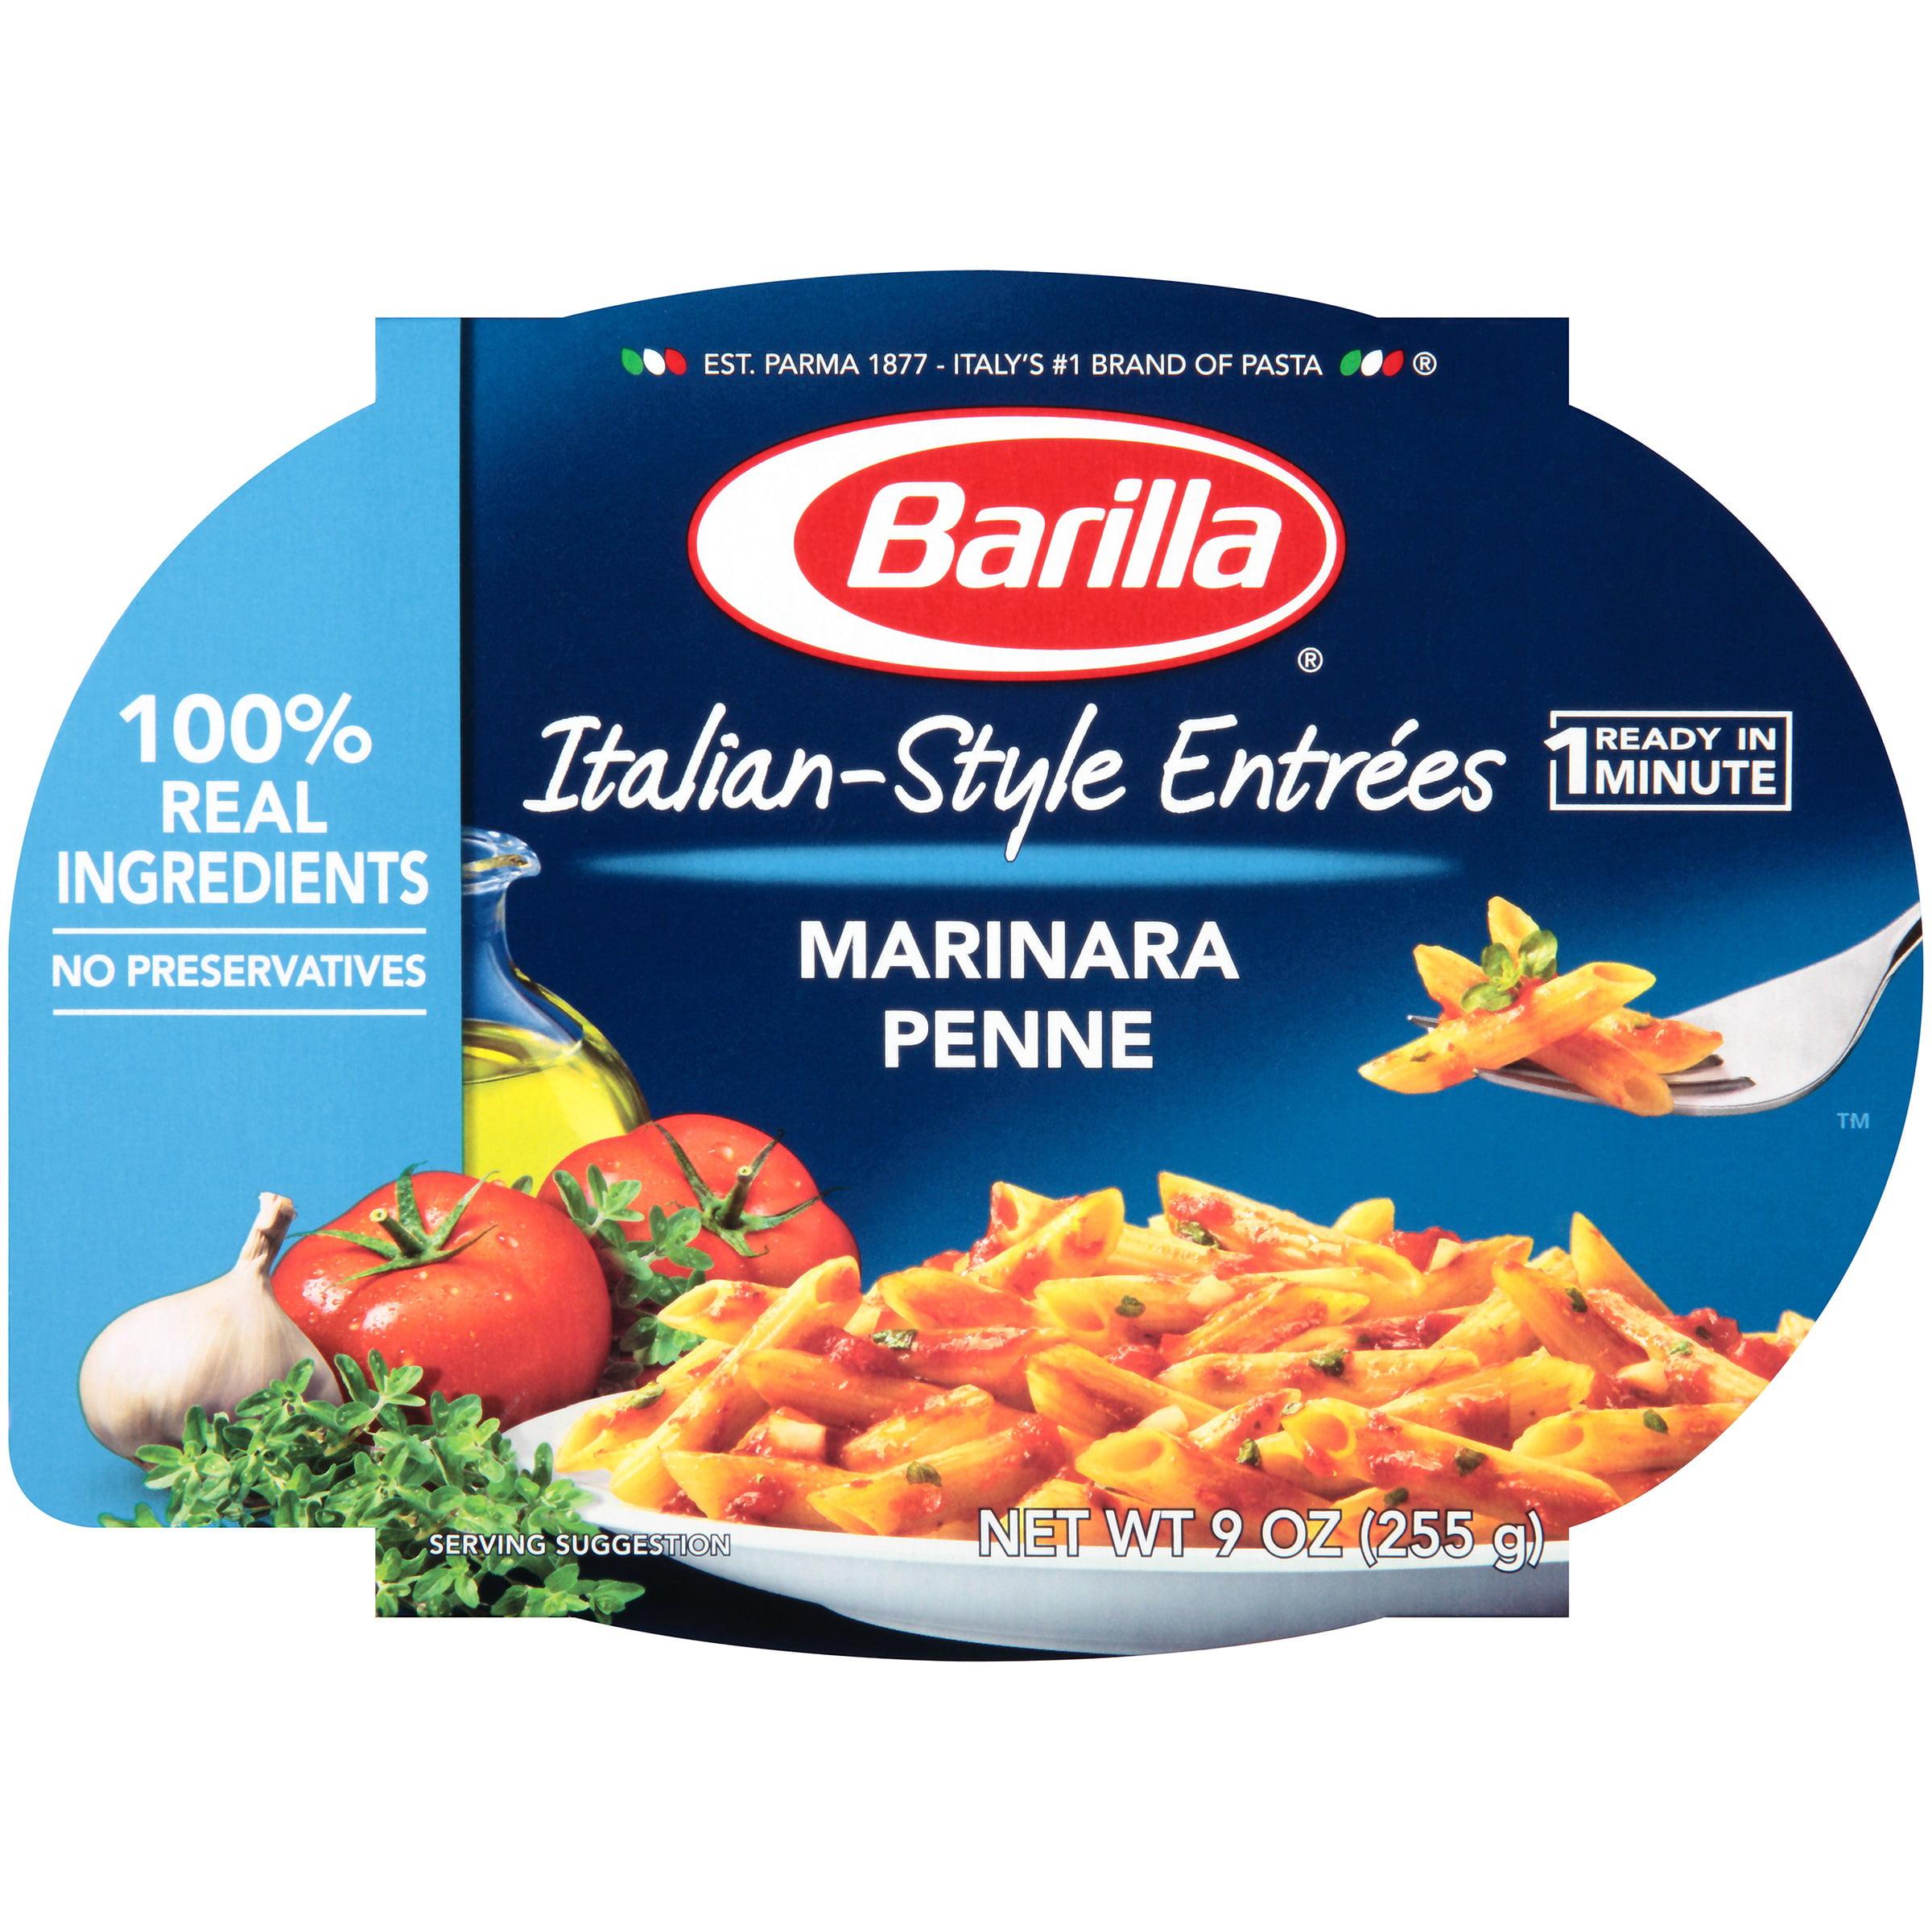 Barilla Mezze Penne Pasta with Traditional Marinara Sauce, 9 oz by Barilla America, Inc